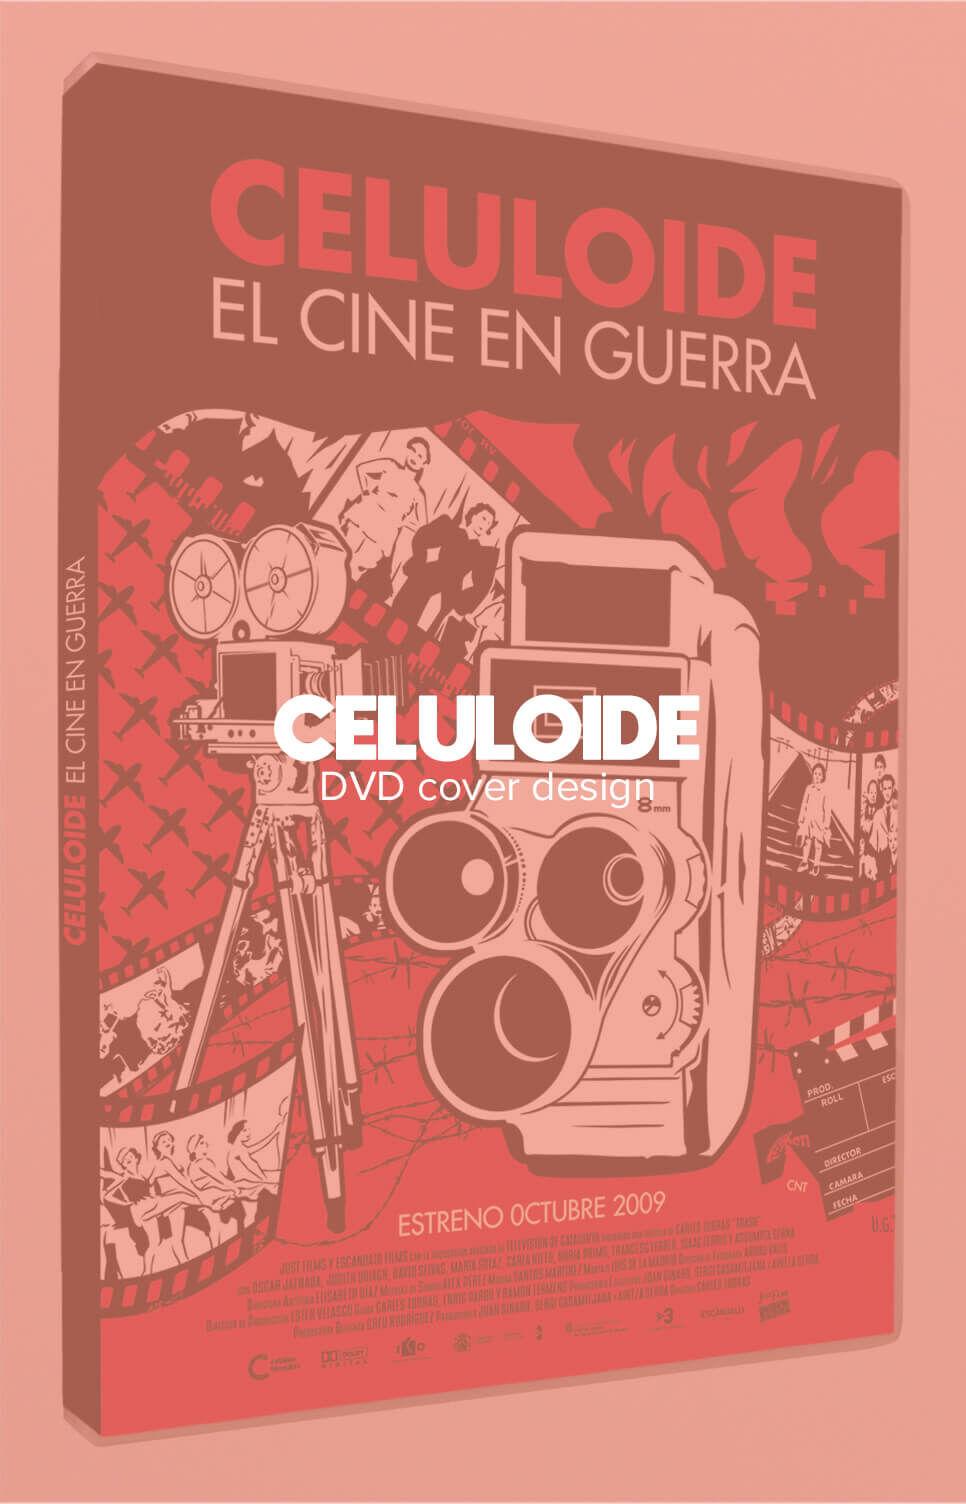 Celuloide2